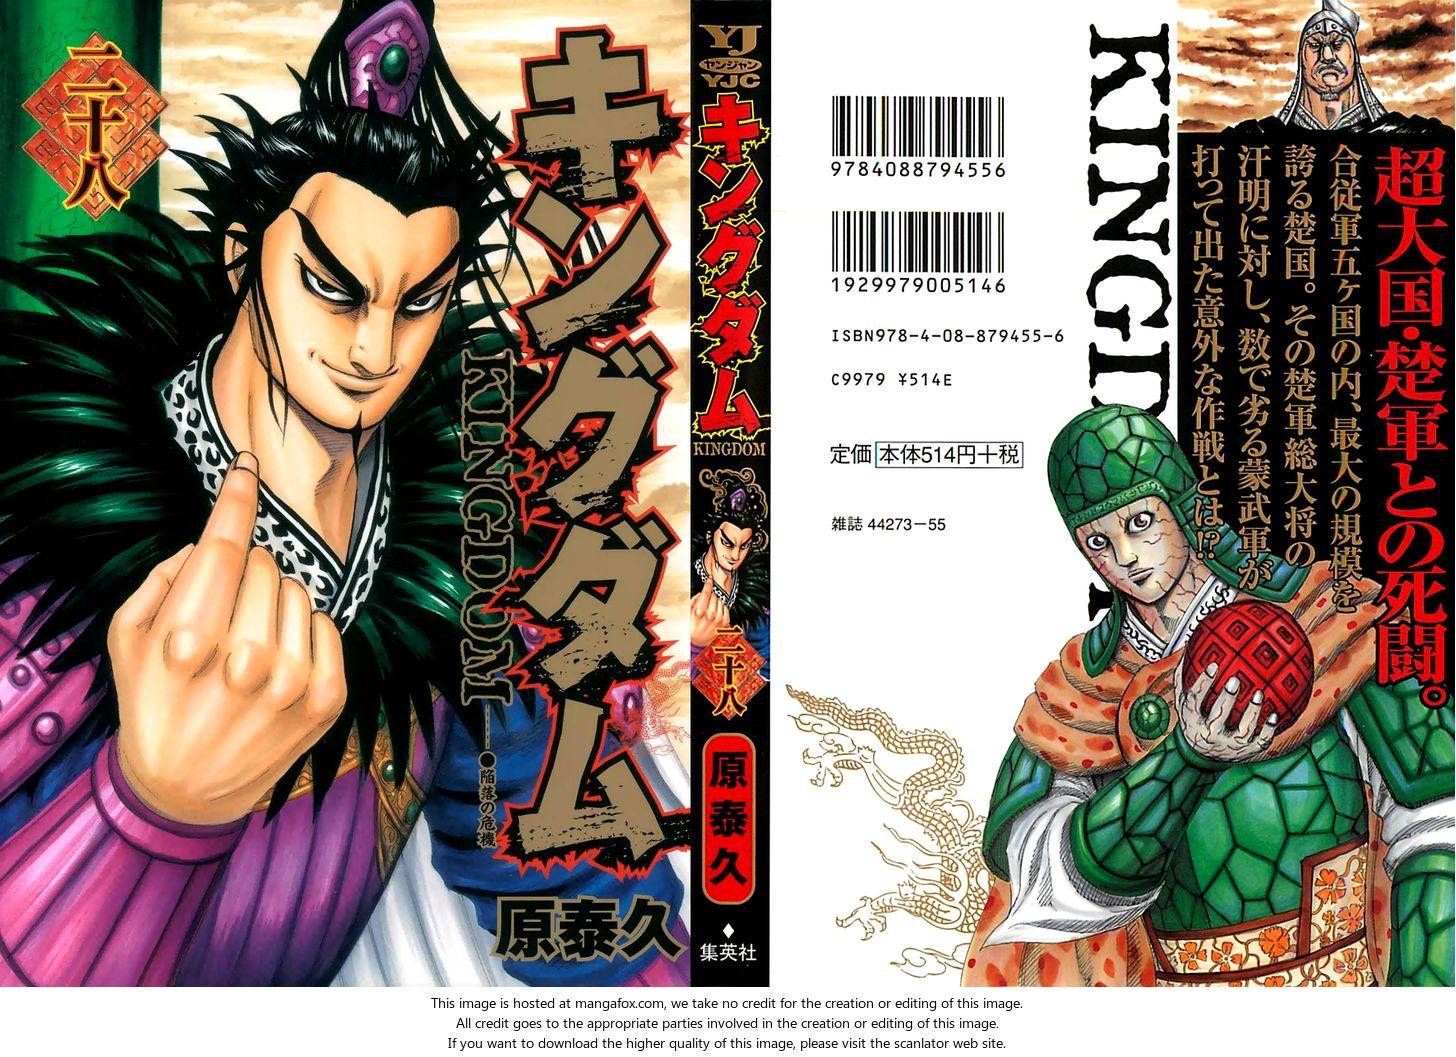 Kingdom 295: A New Form at MangaFox